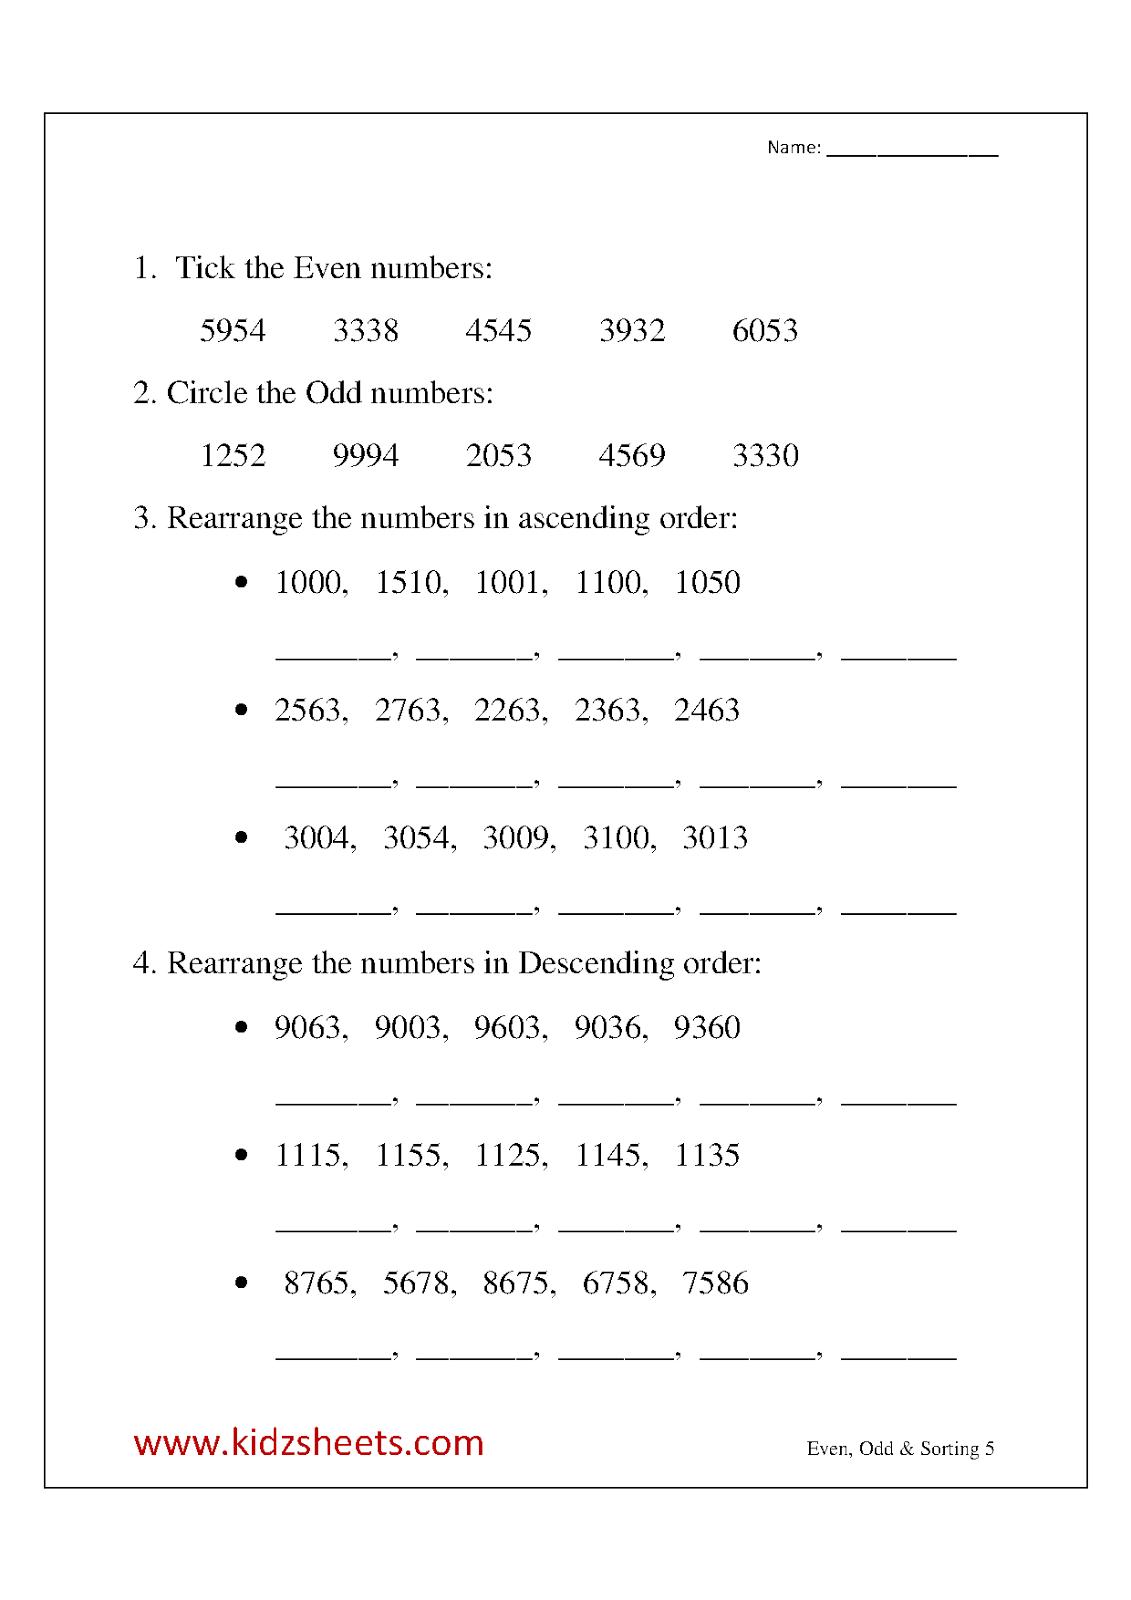 hight resolution of Kidz Worksheets: Third Grade Even